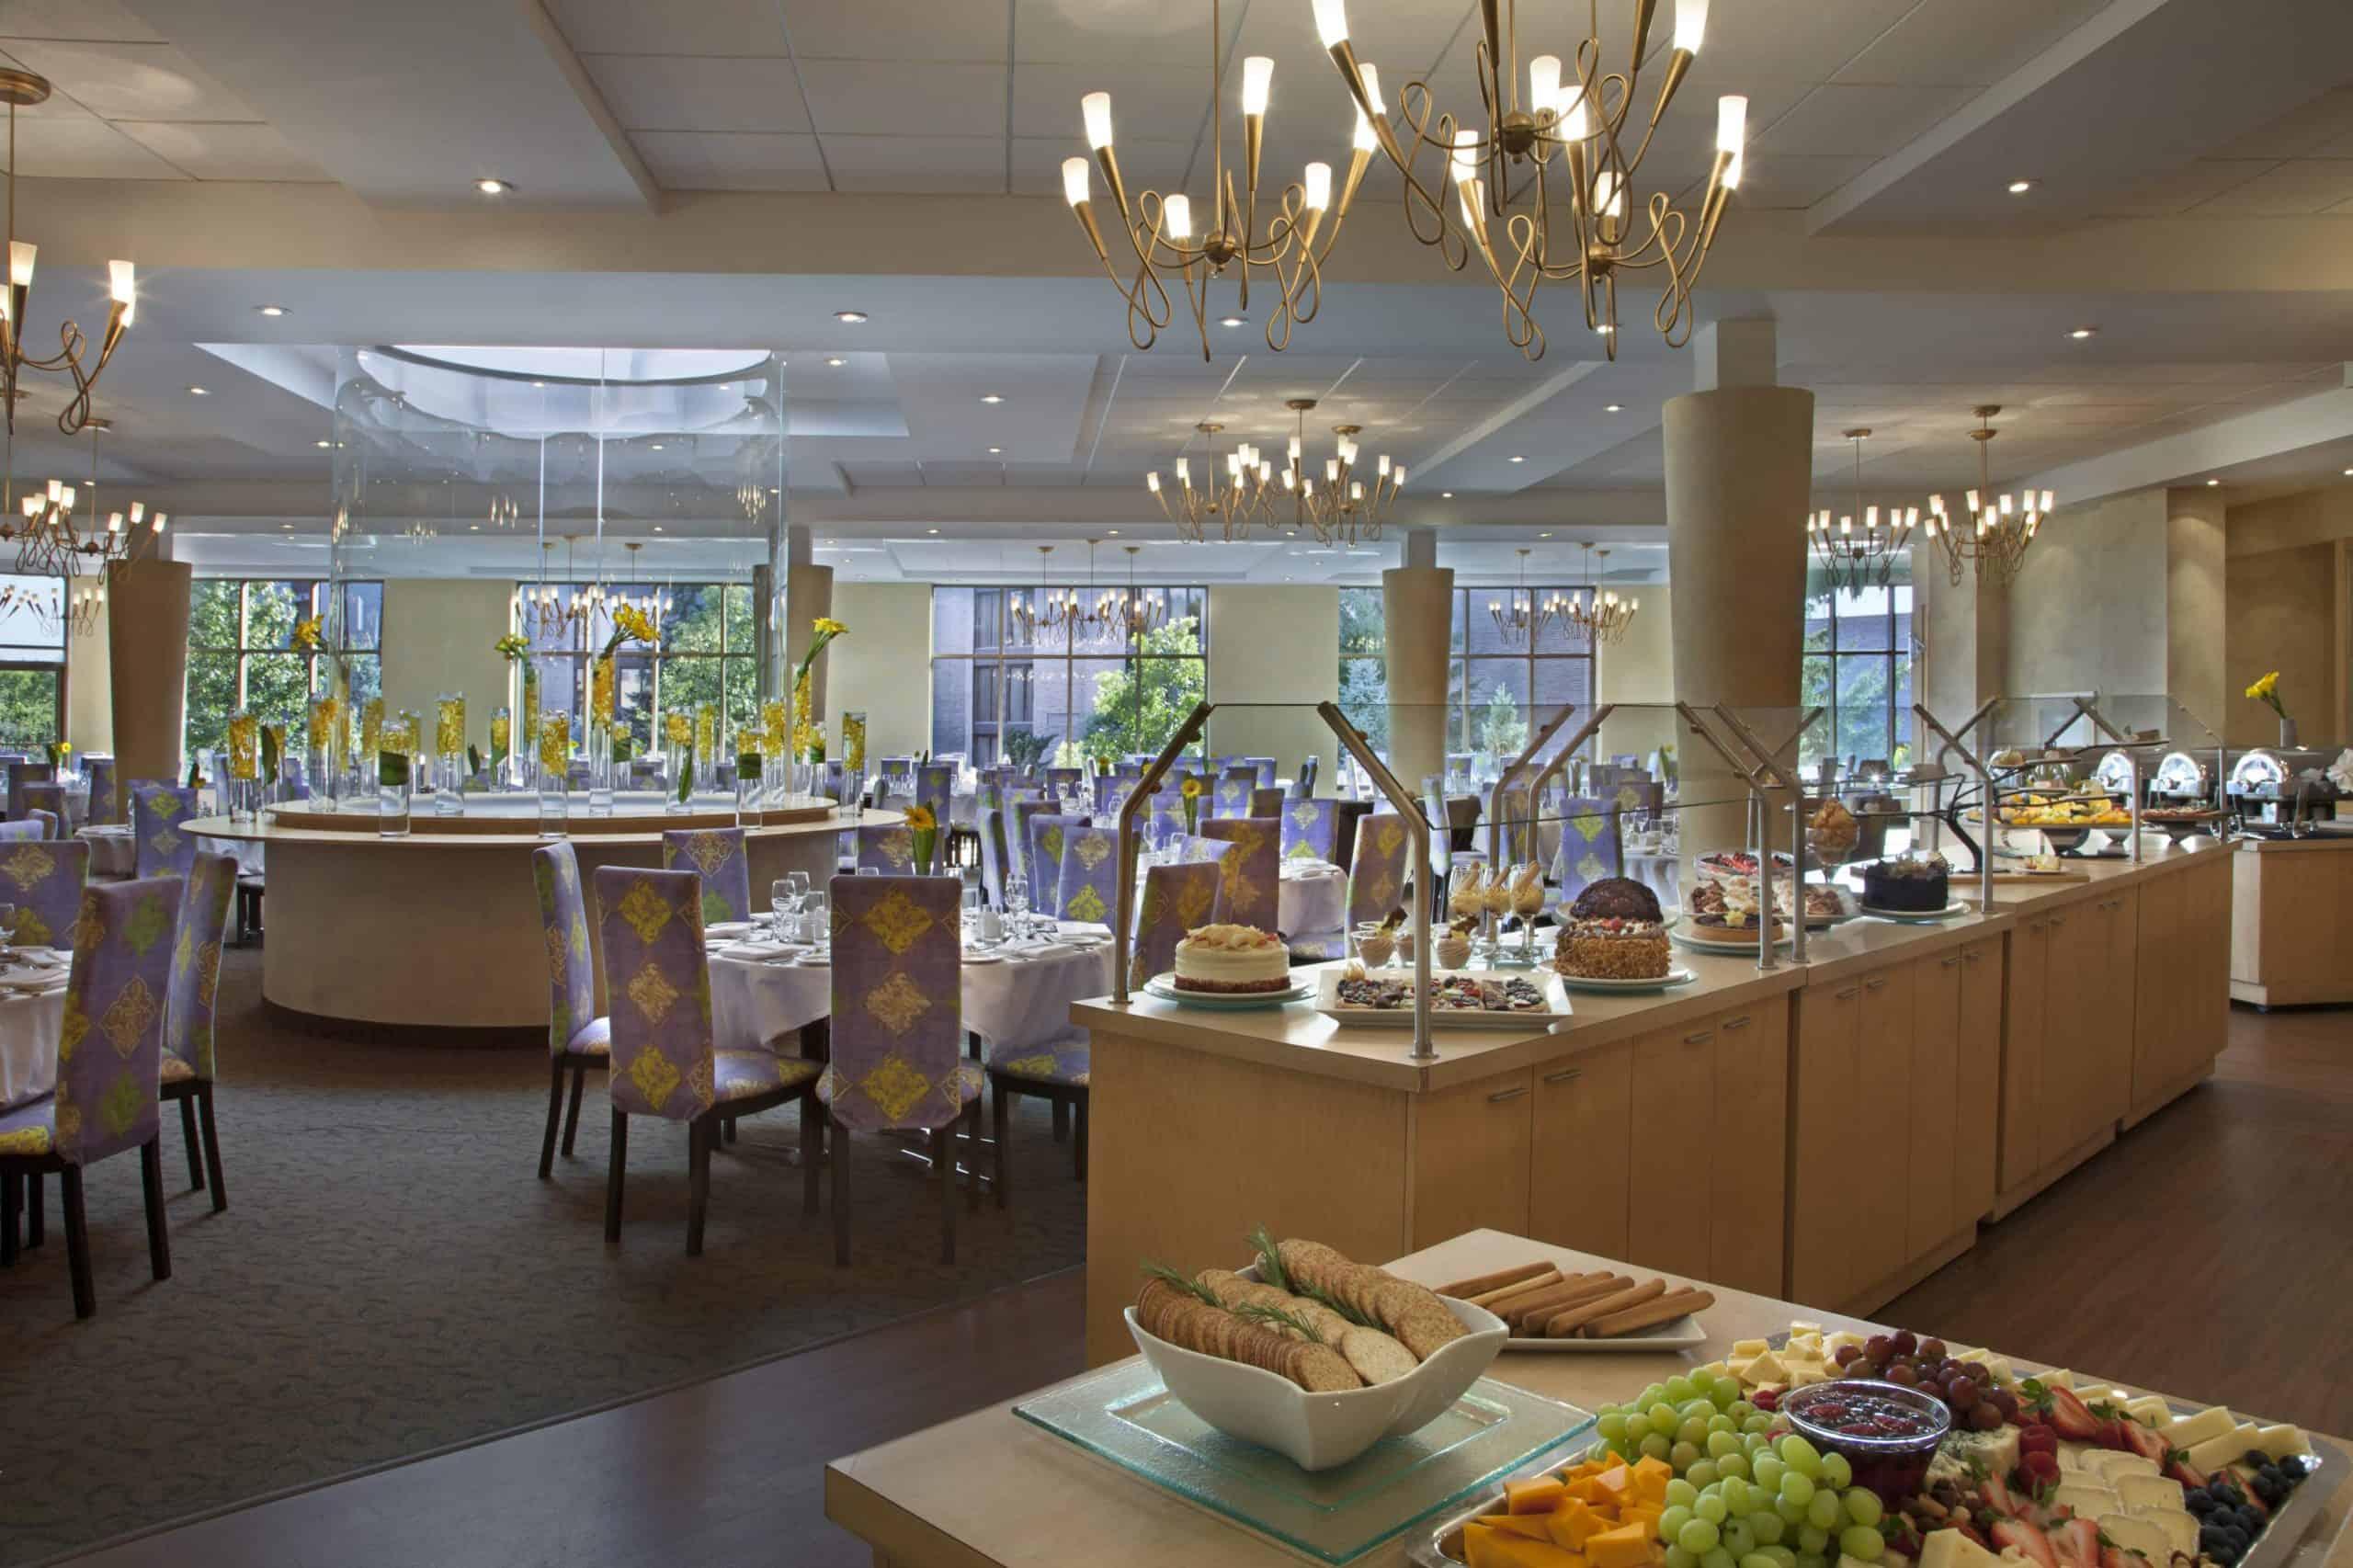 Sunhill Restaurant Buffet at the White Oaks.